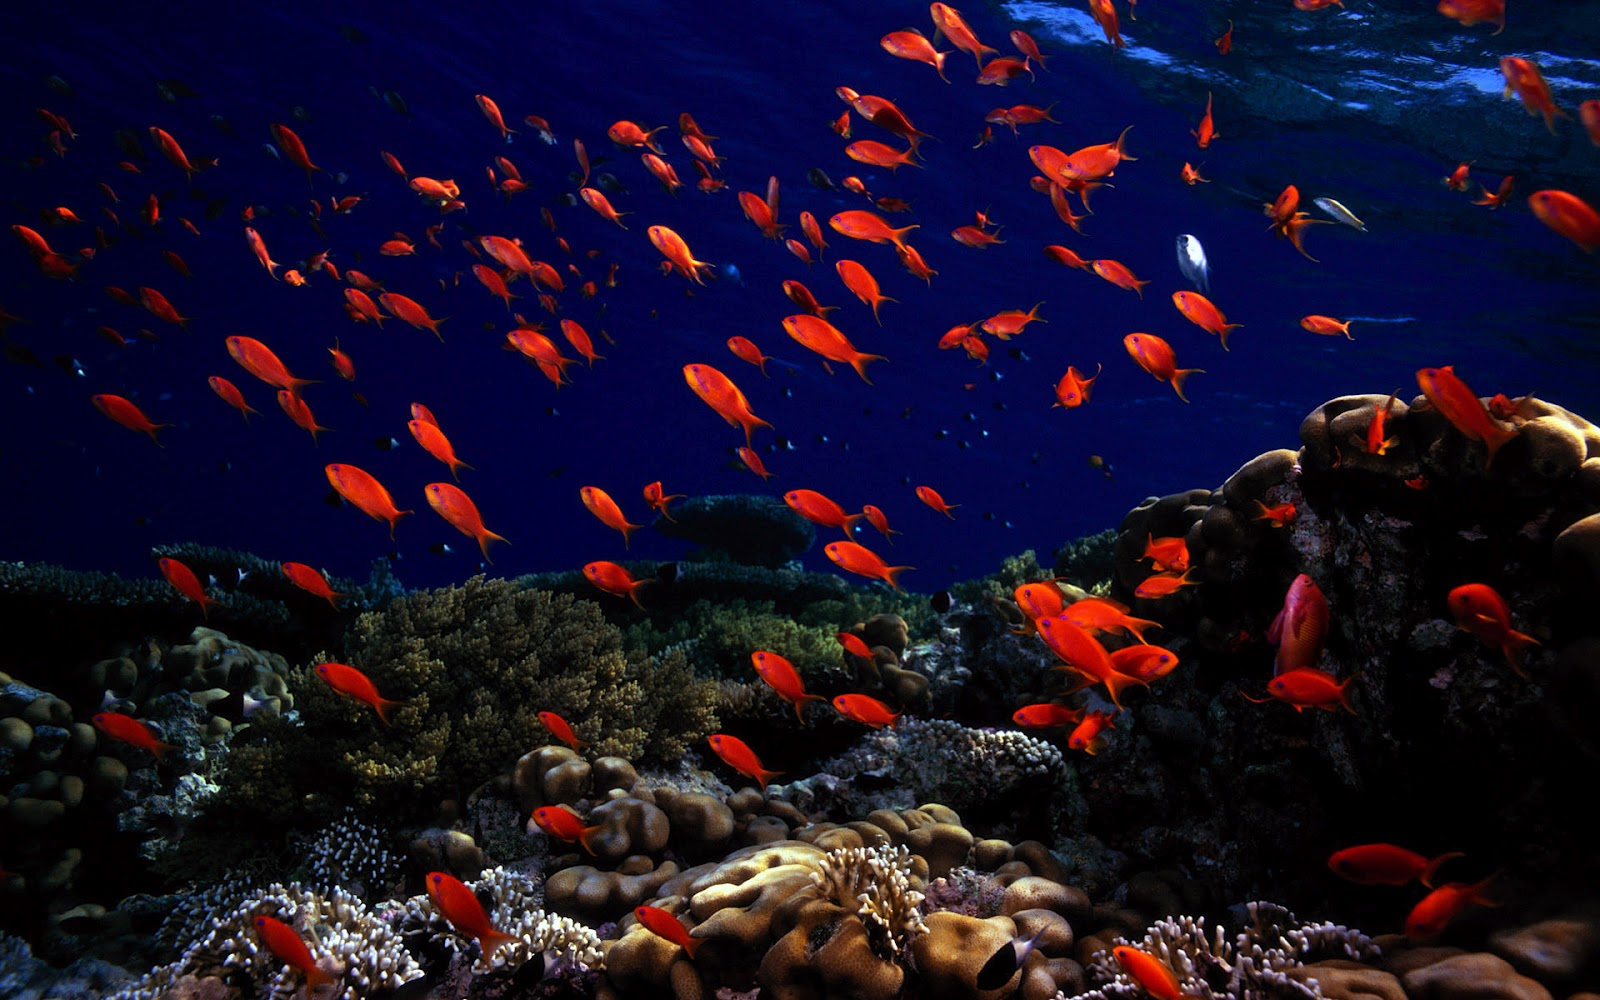 Must see   Wallpaper Horse Ocean - Ocean-life-wallpapers-marine-life-on-the-seabed-like-fish-plants-animals-hd-wallpaper-22  Gallery_68467.jpg